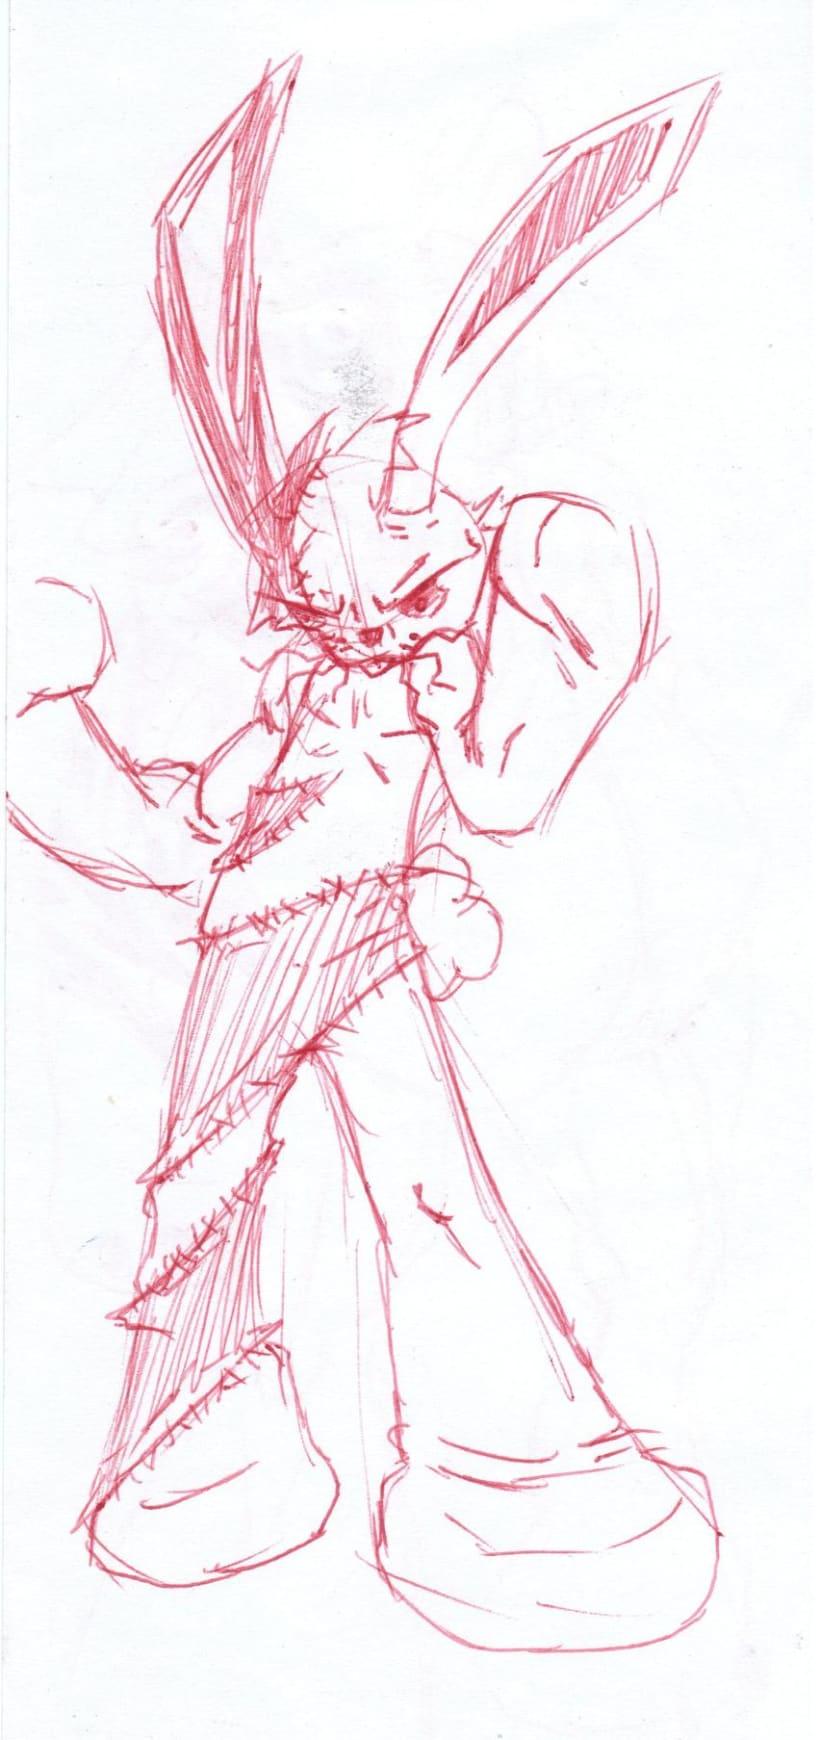 varios dibujos a boli 5